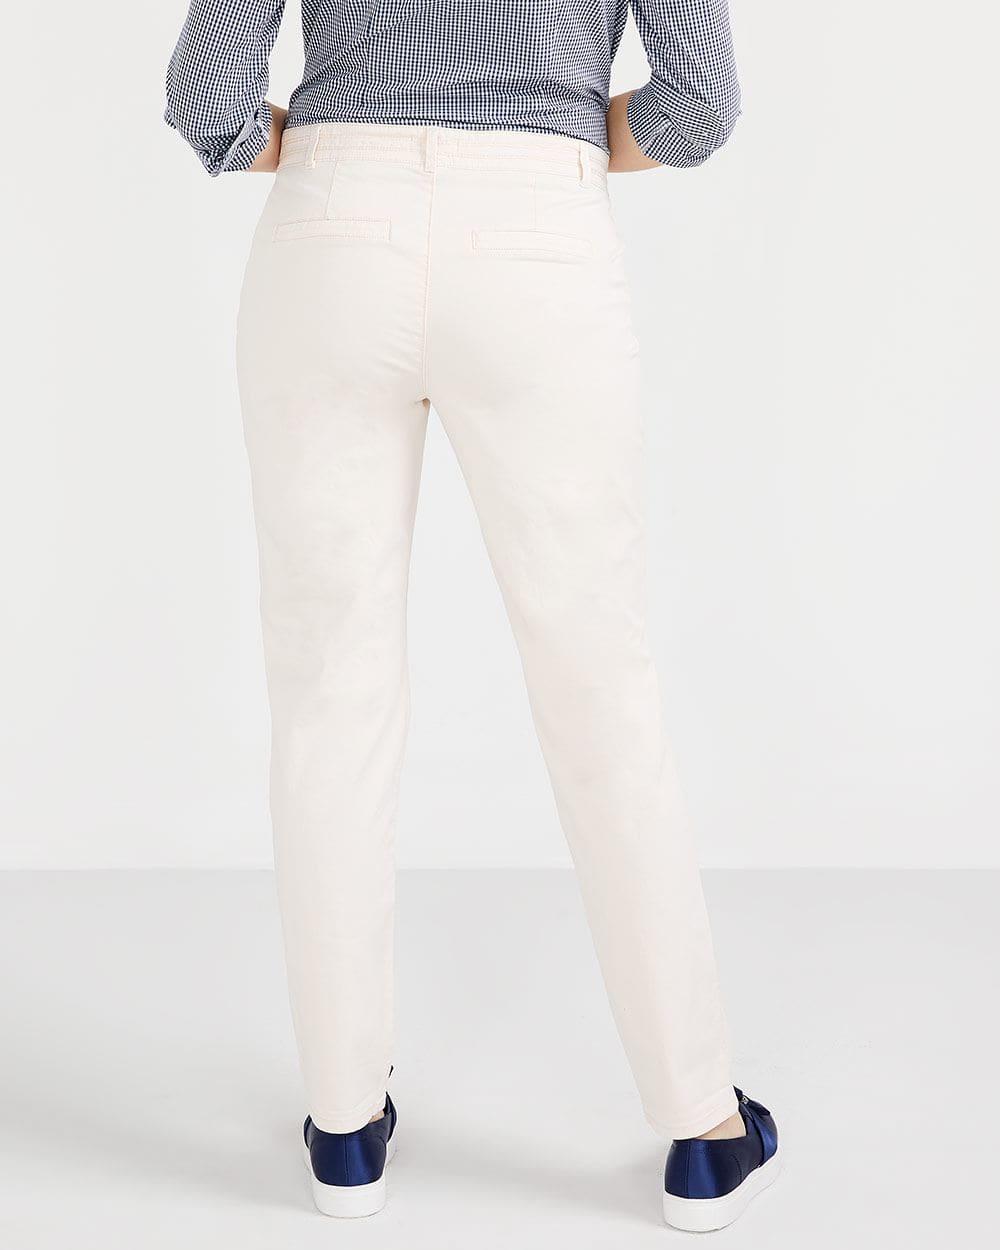 Pantalon uni Chino à jambe étroite